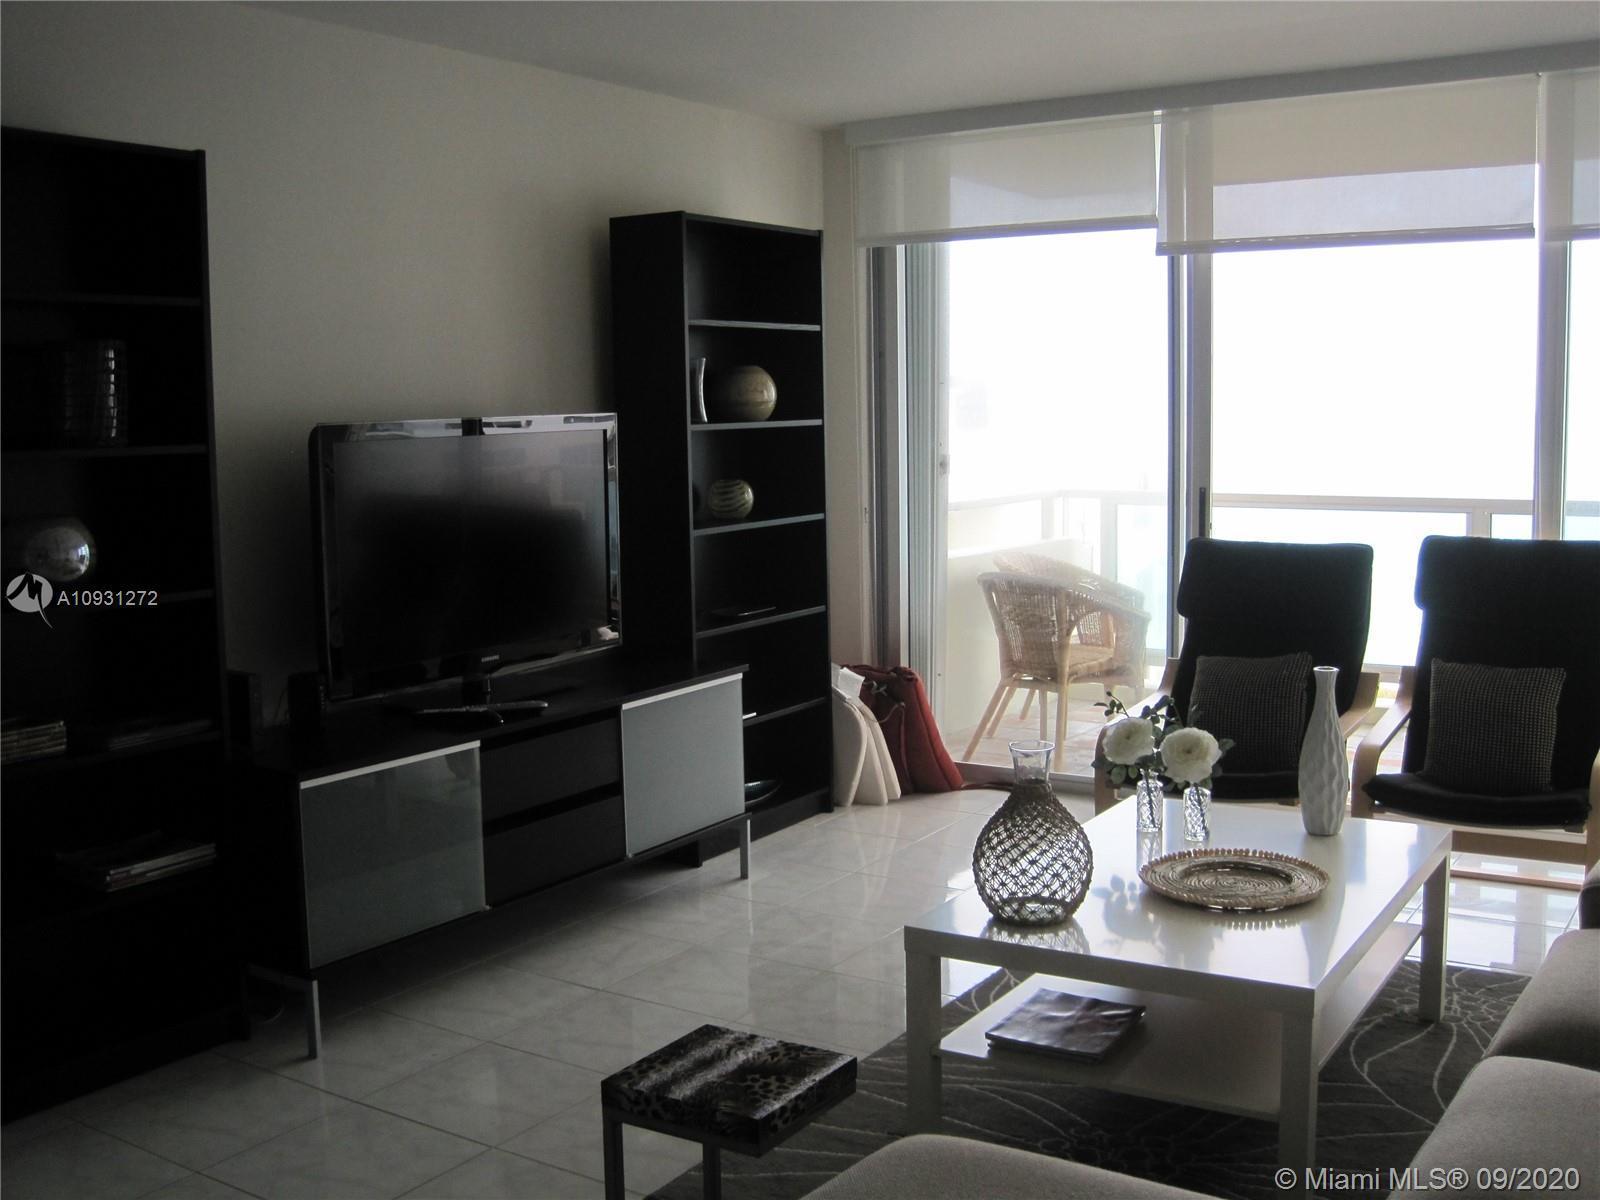 2 Bedroom - 2 baths at prestigious Seacoast 5151 Condominium in Miami Beach Millionaire's Row; Full